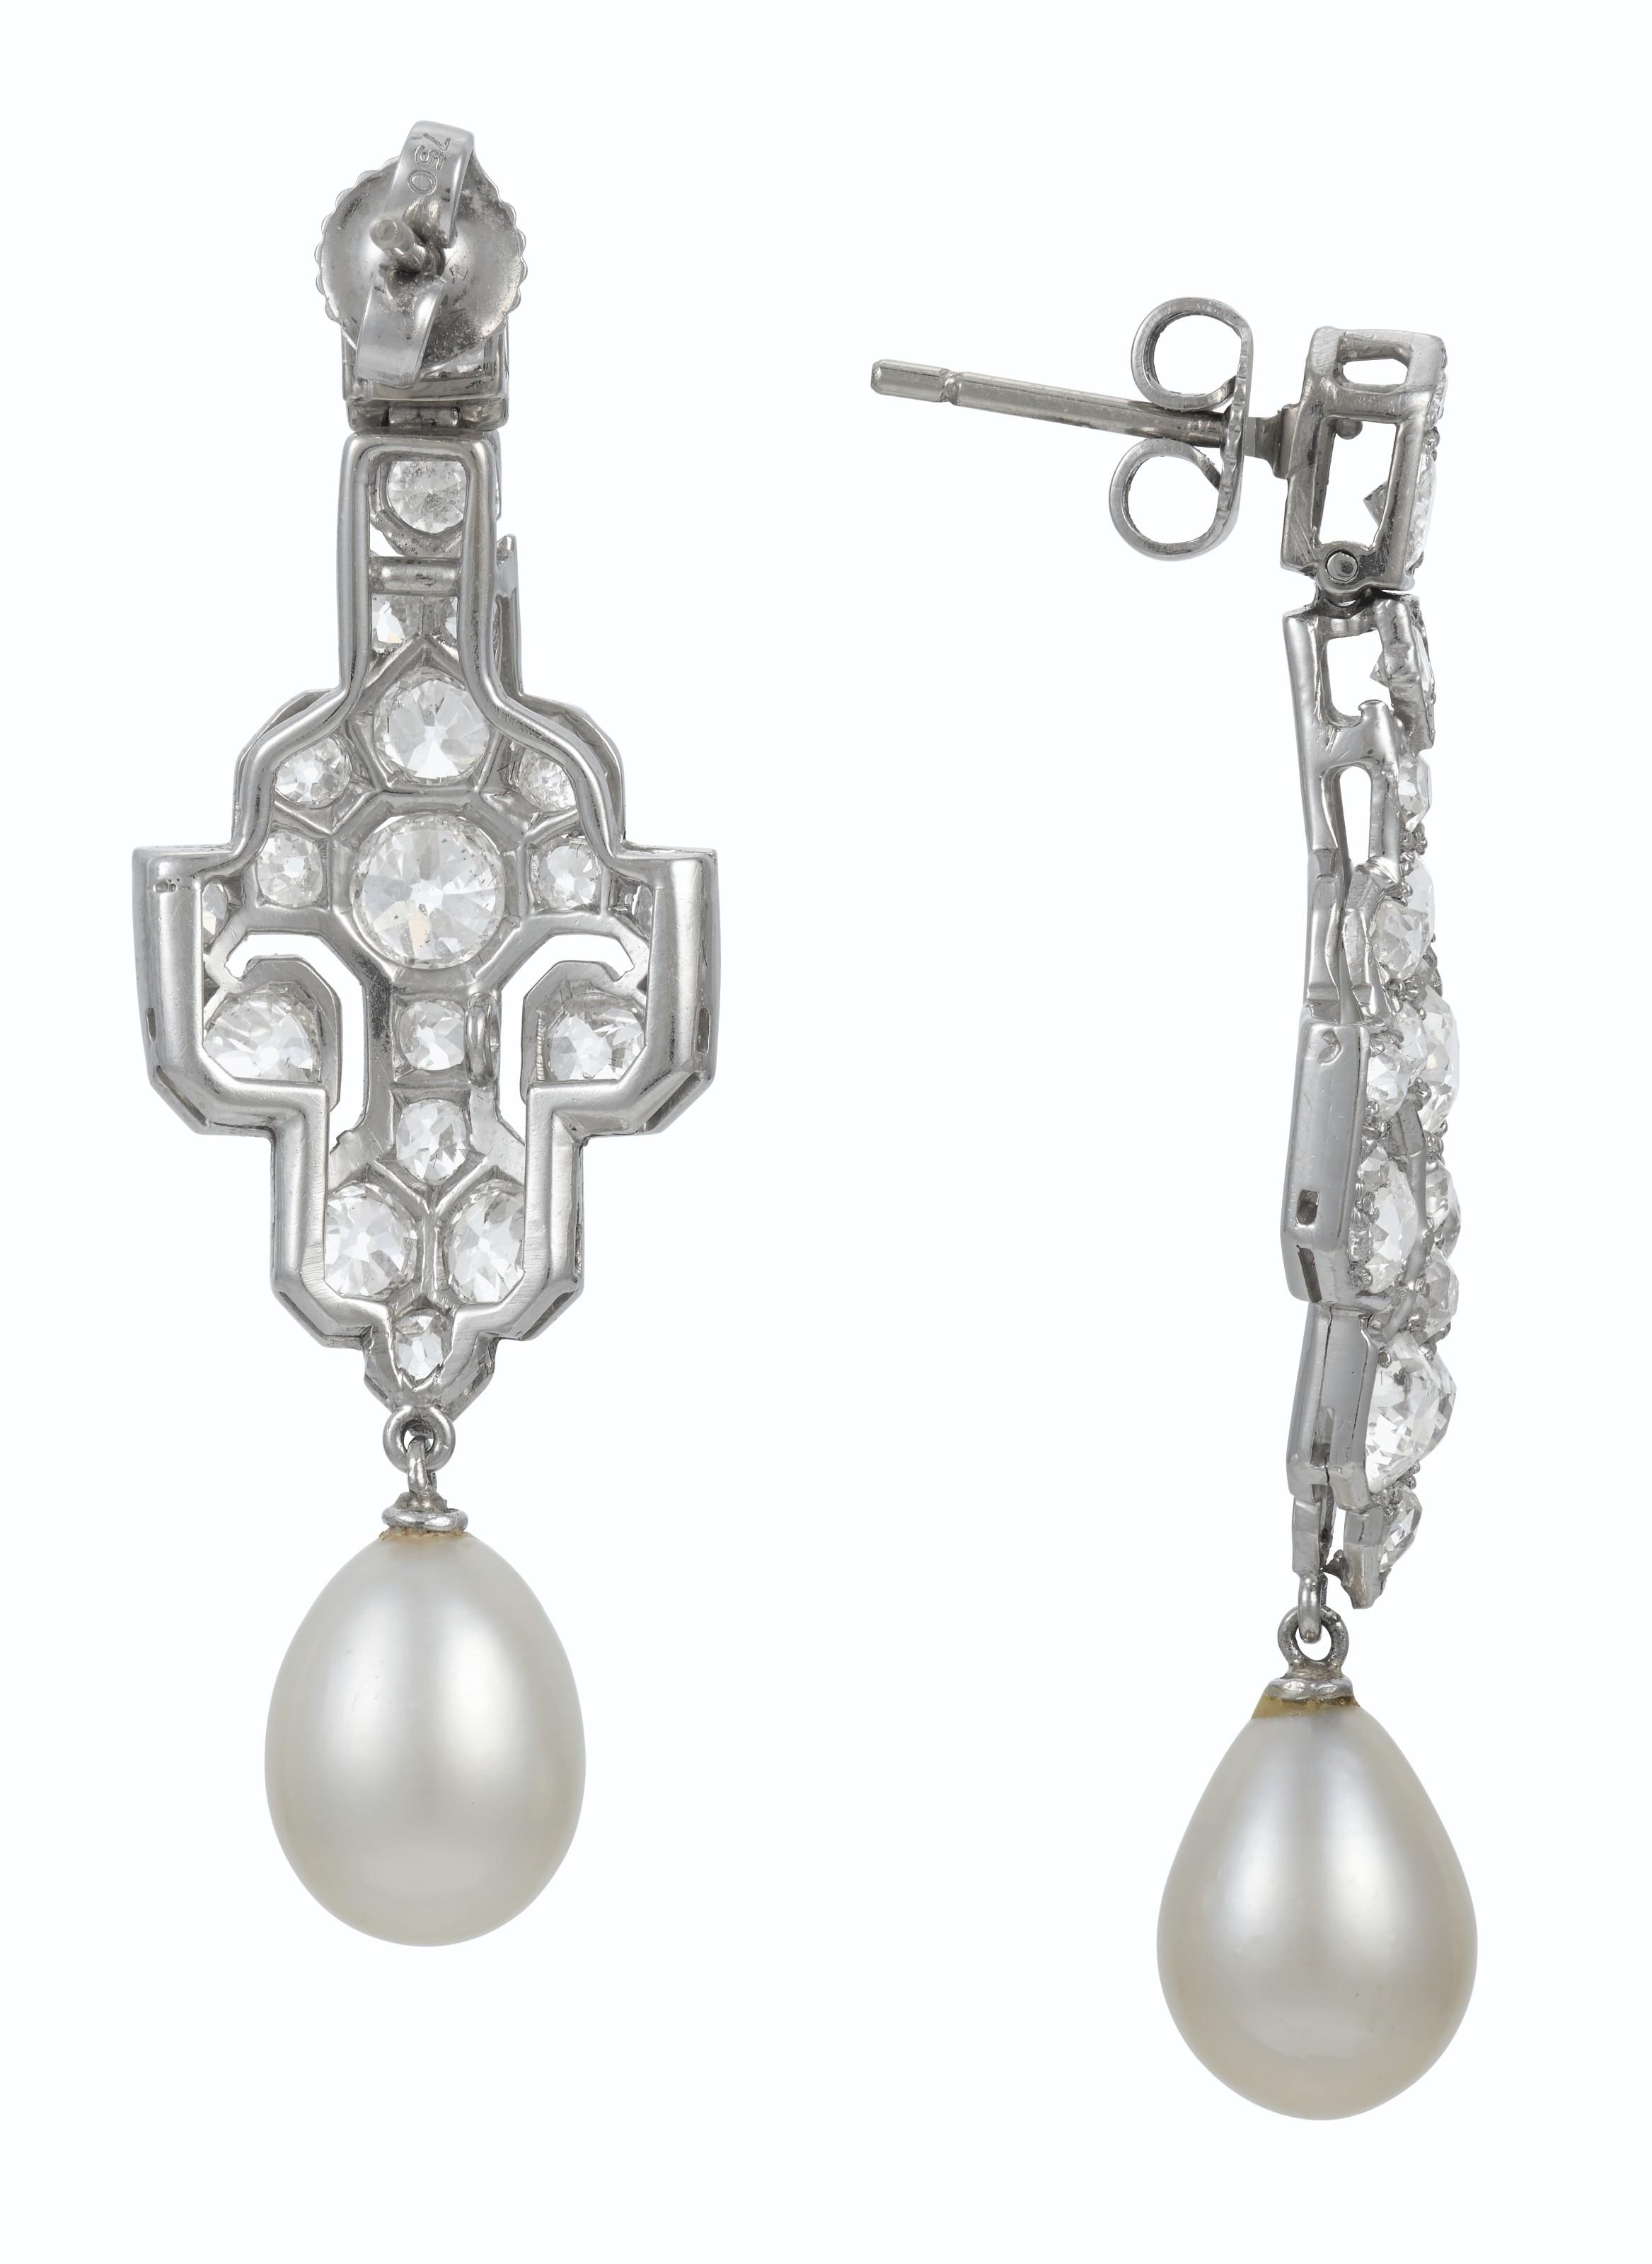 NATURAL PEARL AND DIAMOND EARRINGS